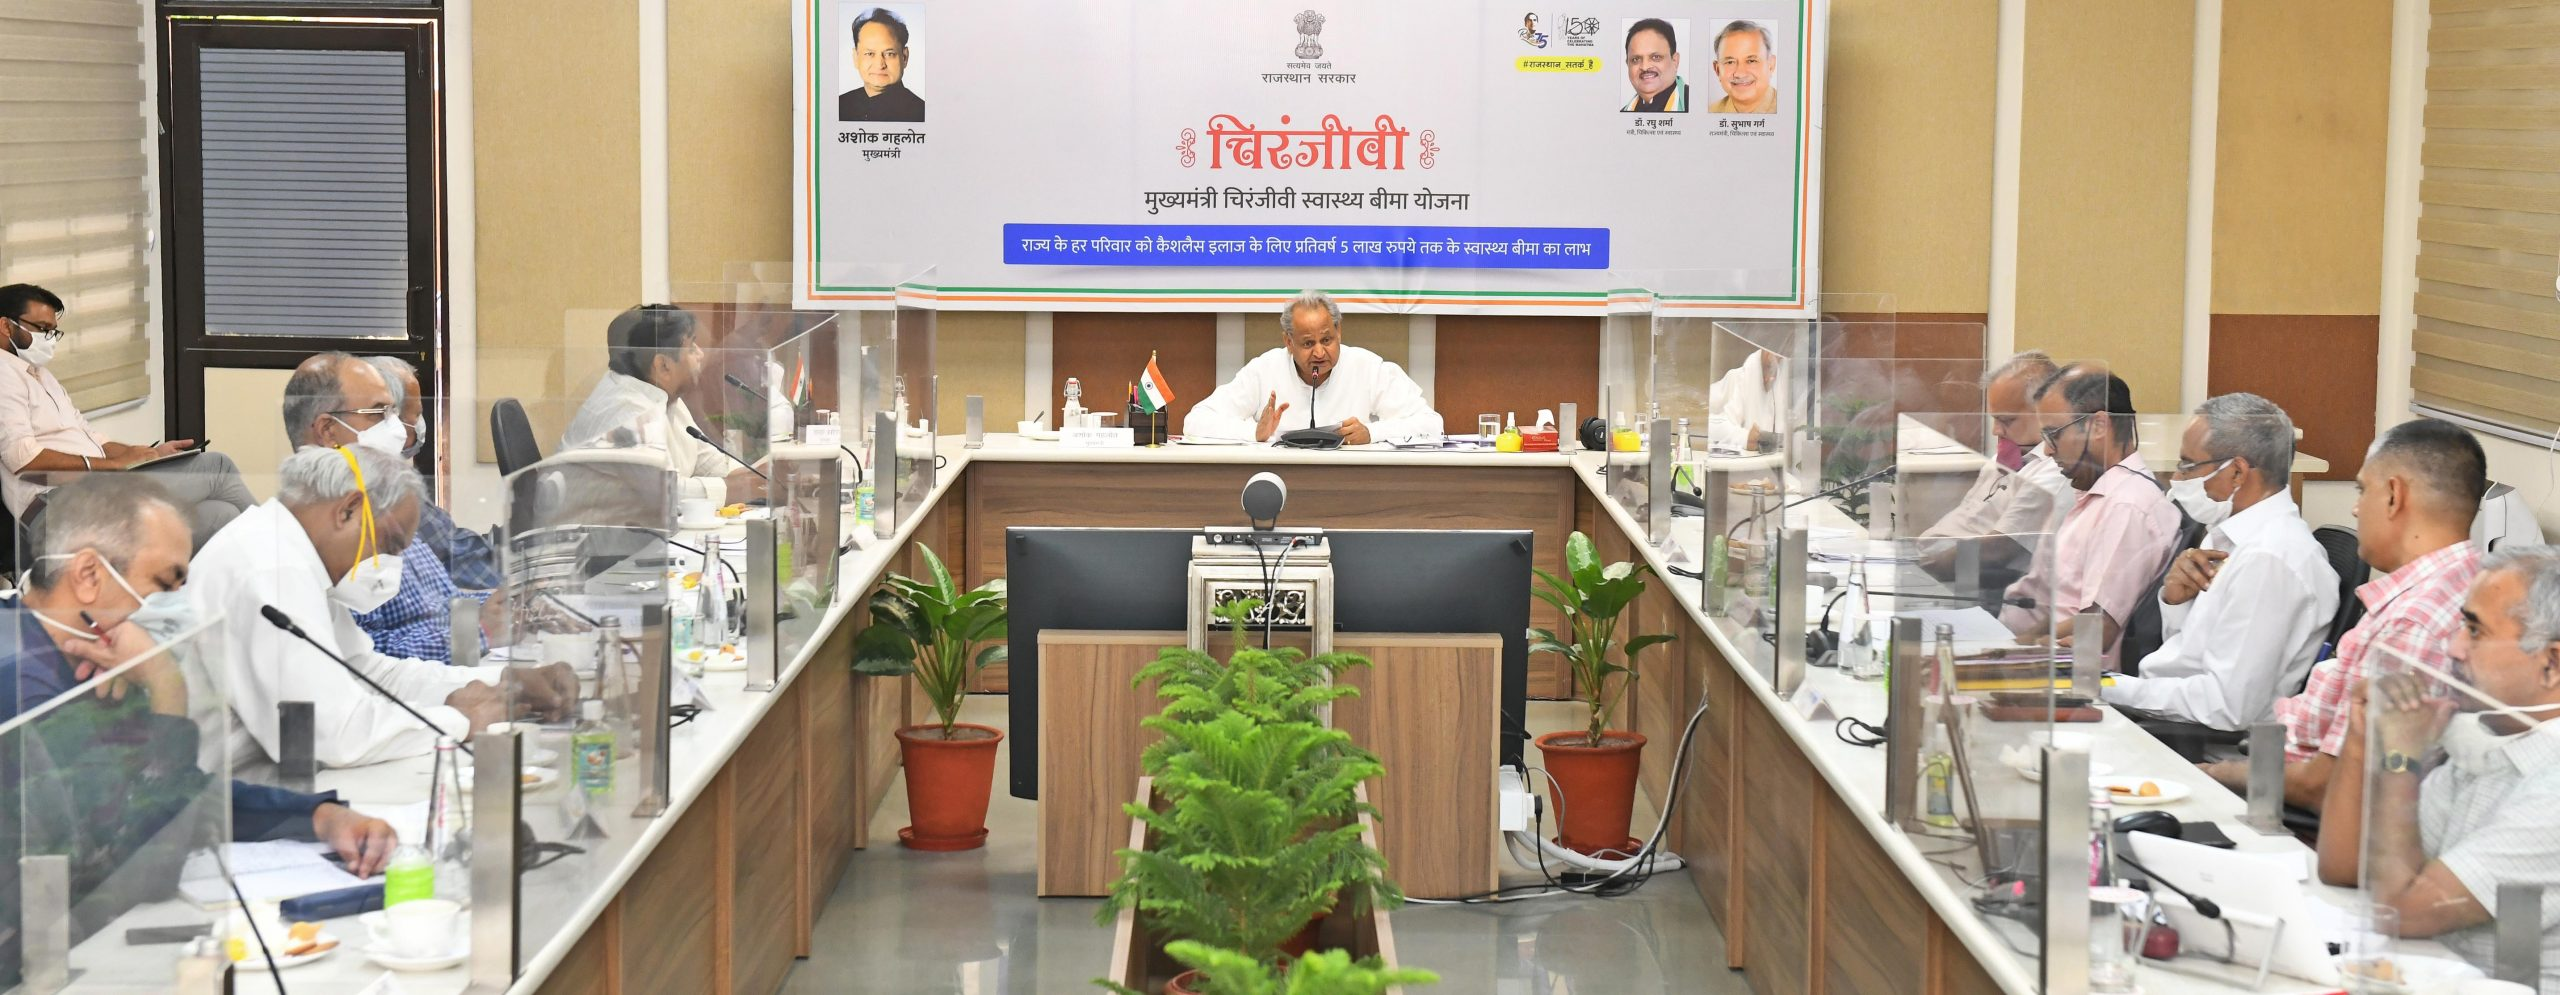 Mukhya Mantri Chiranjeevi Swasthya Bima Yojana, Chiranjeevi Health Insurance Scheme, treatment, Chief Minister, Chiranjeevi, Chiranjeevi Swasthya Bima Yojana,